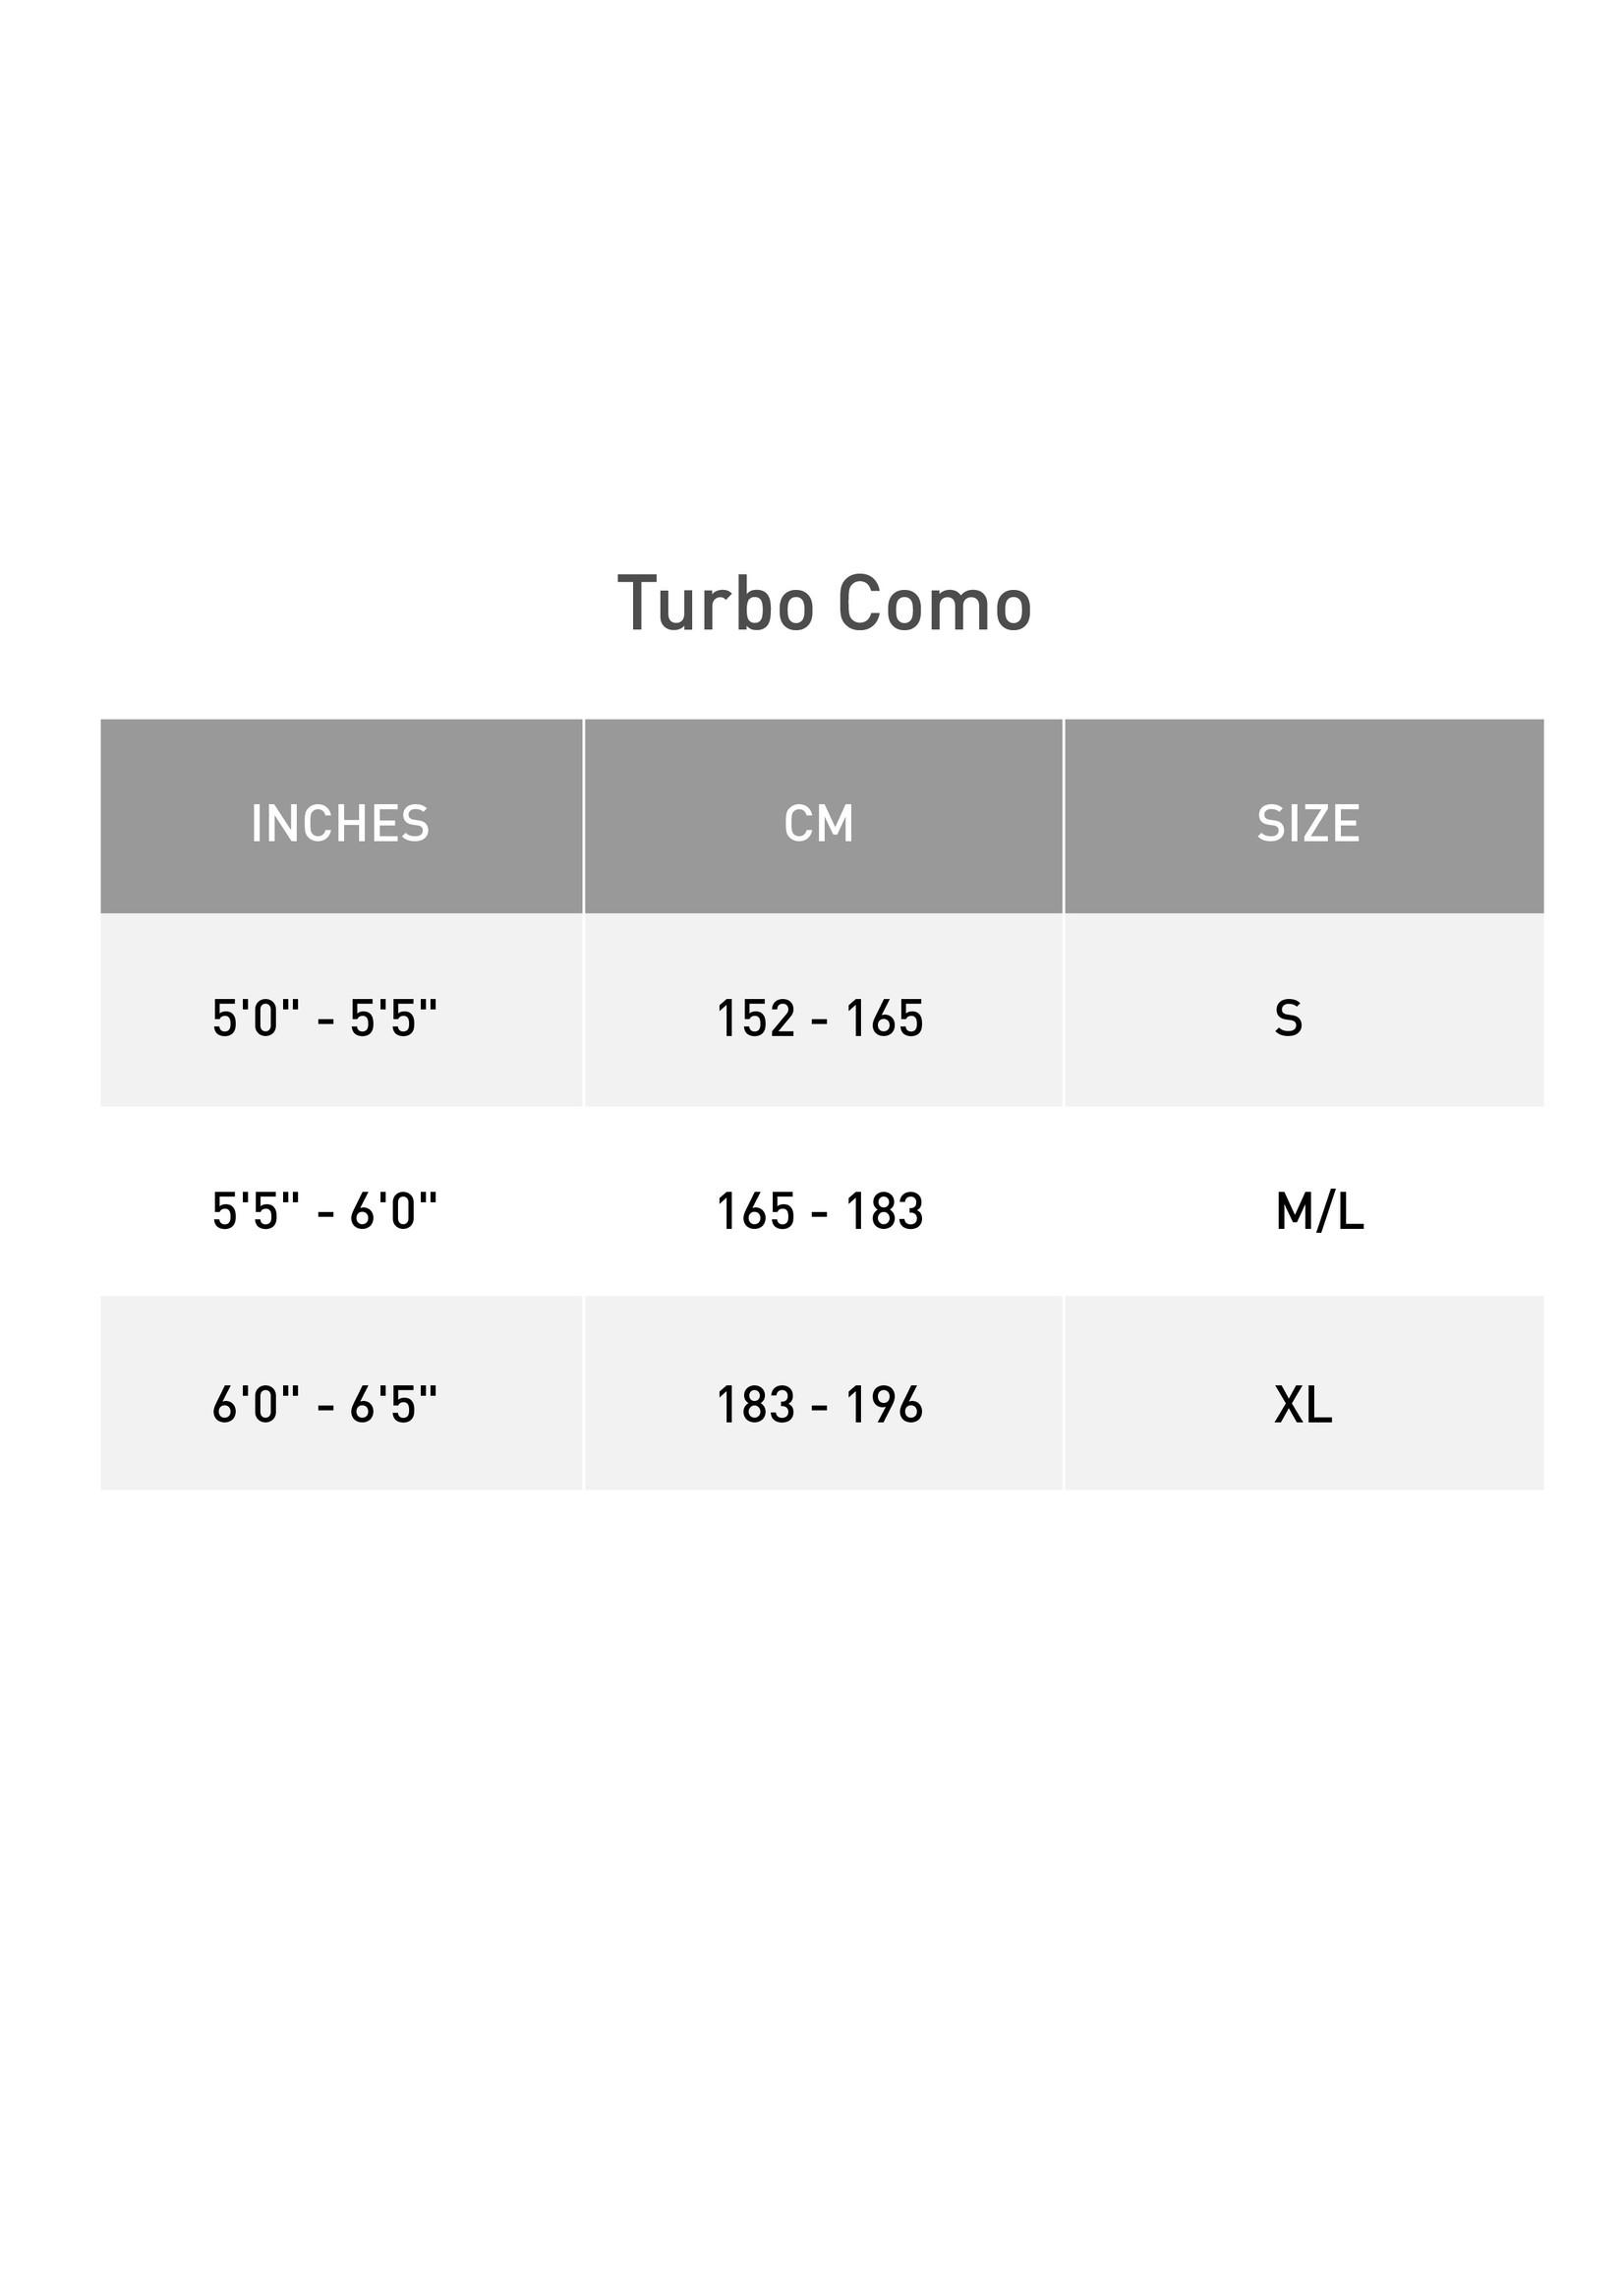 Specialized COMO 4.0 650B CHAR/BLK/CHRM S